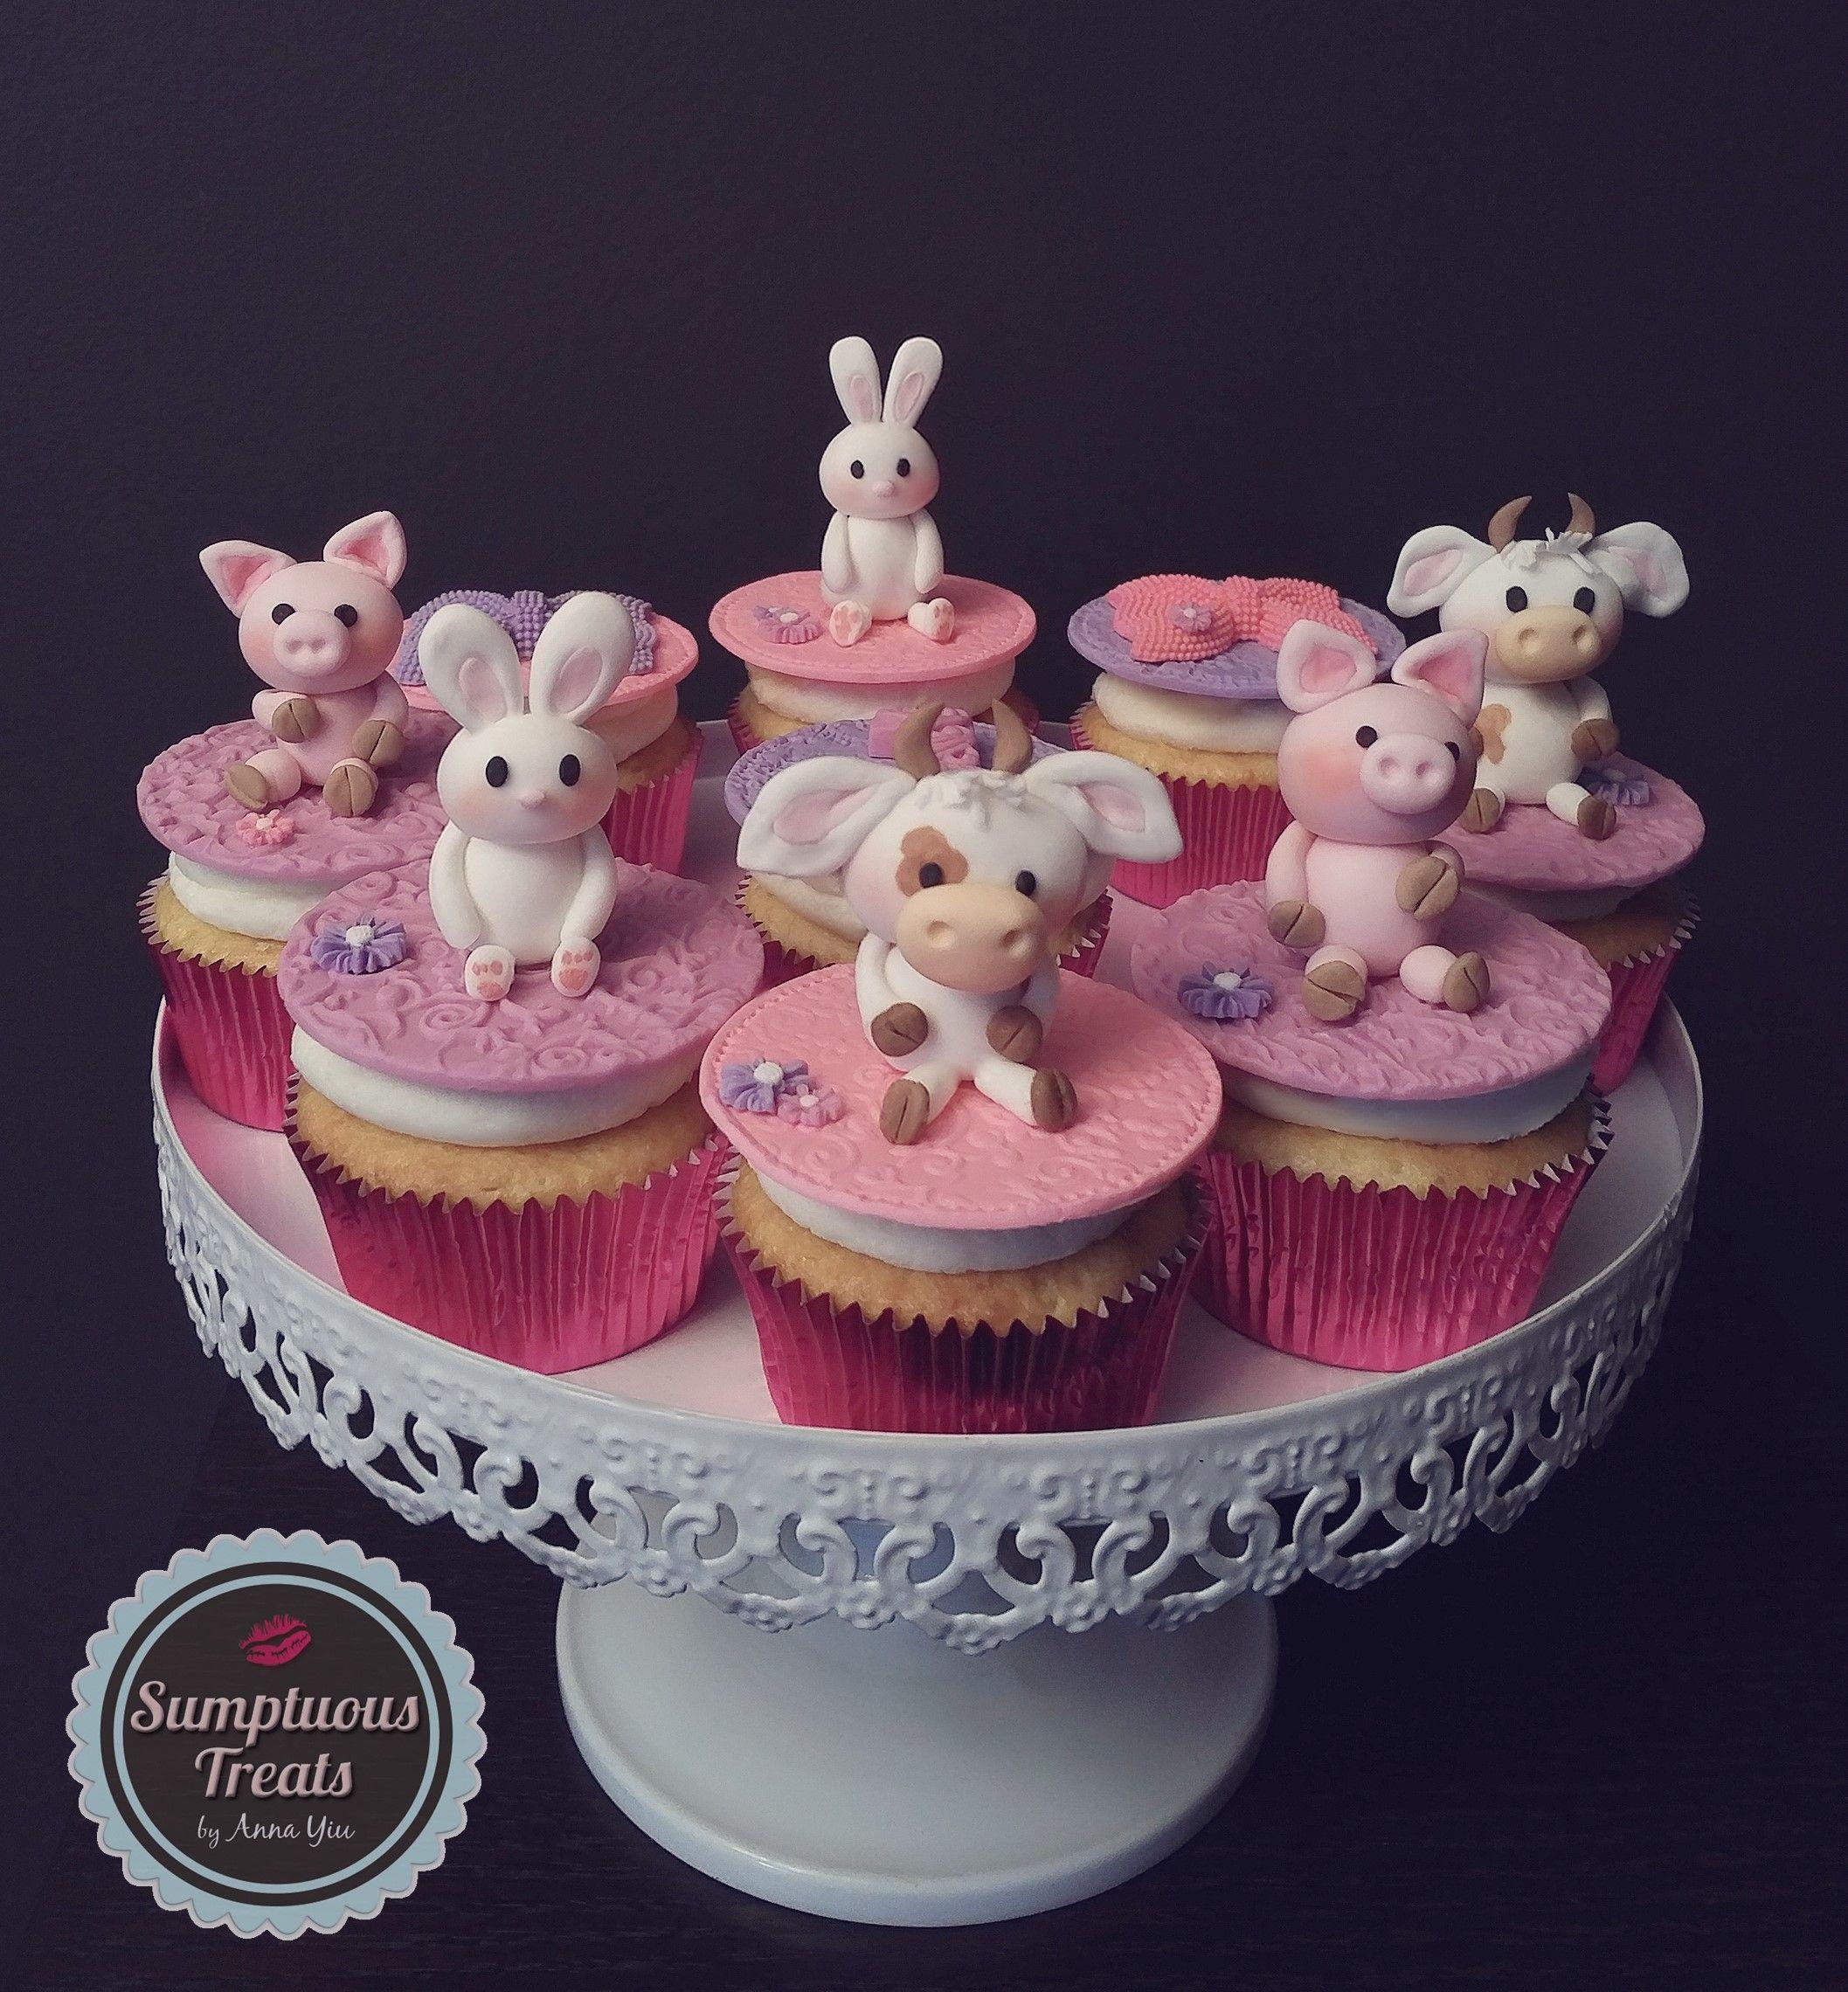 Cute Farm Animal 1st Birthday Cupcakes Purple Pink Theme Custom Made To Order Cakes Cookies Edible Art Sumptuoustreats